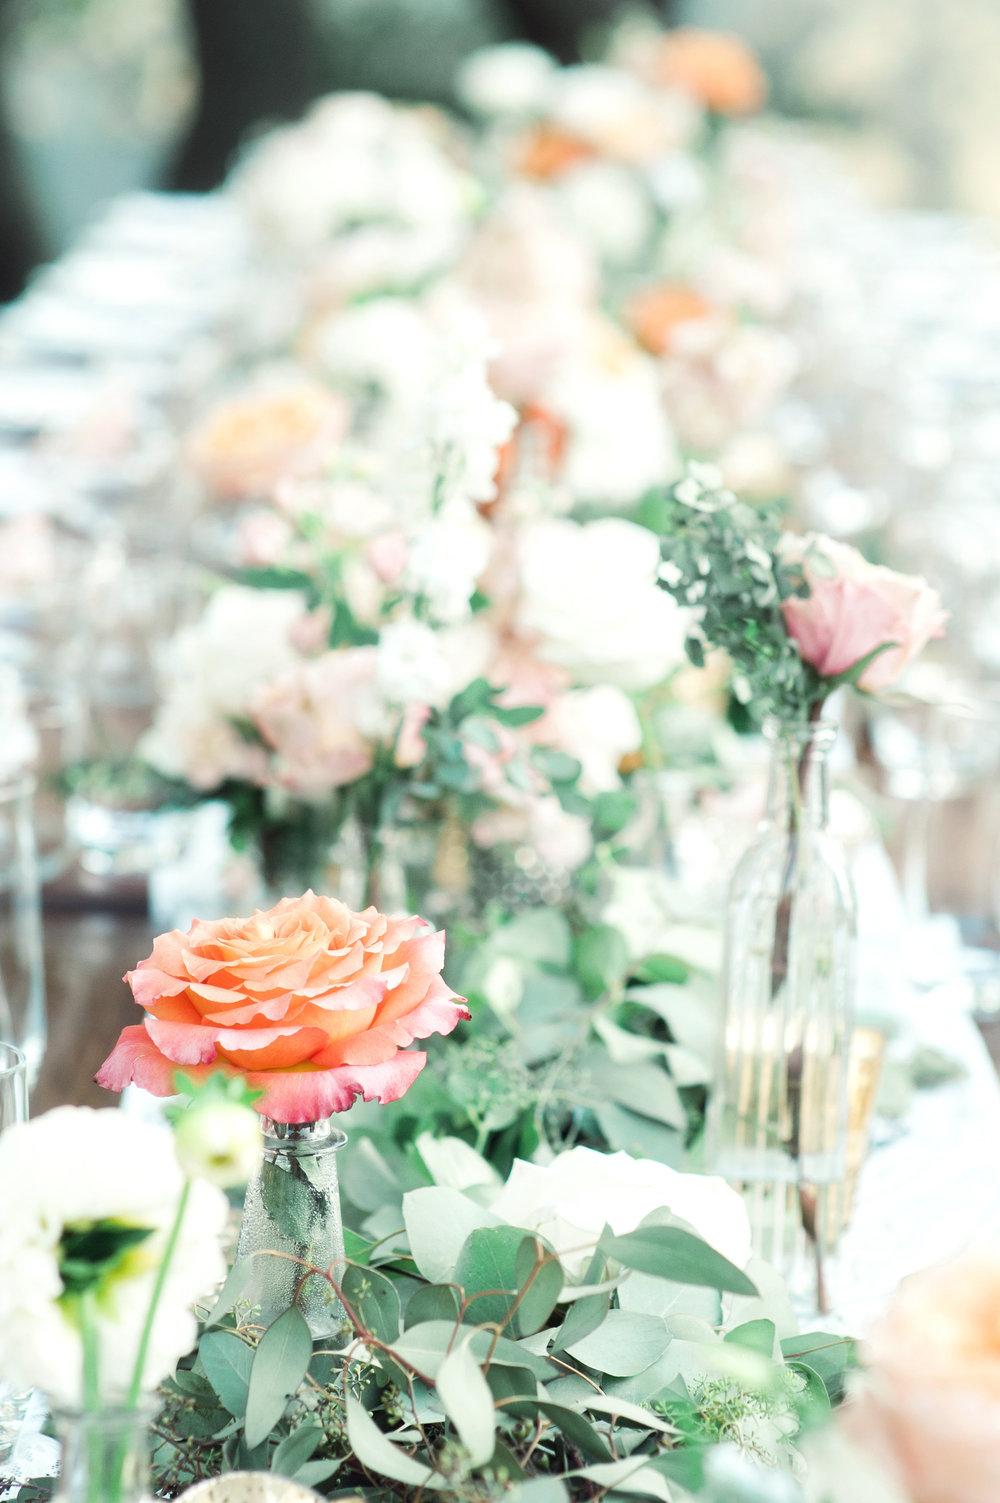 santabarbarawedding.com | Wisteria Lane Flroal Design Studio | Bride and Groom | Garden Roses | Table Decor | Wedding Floral